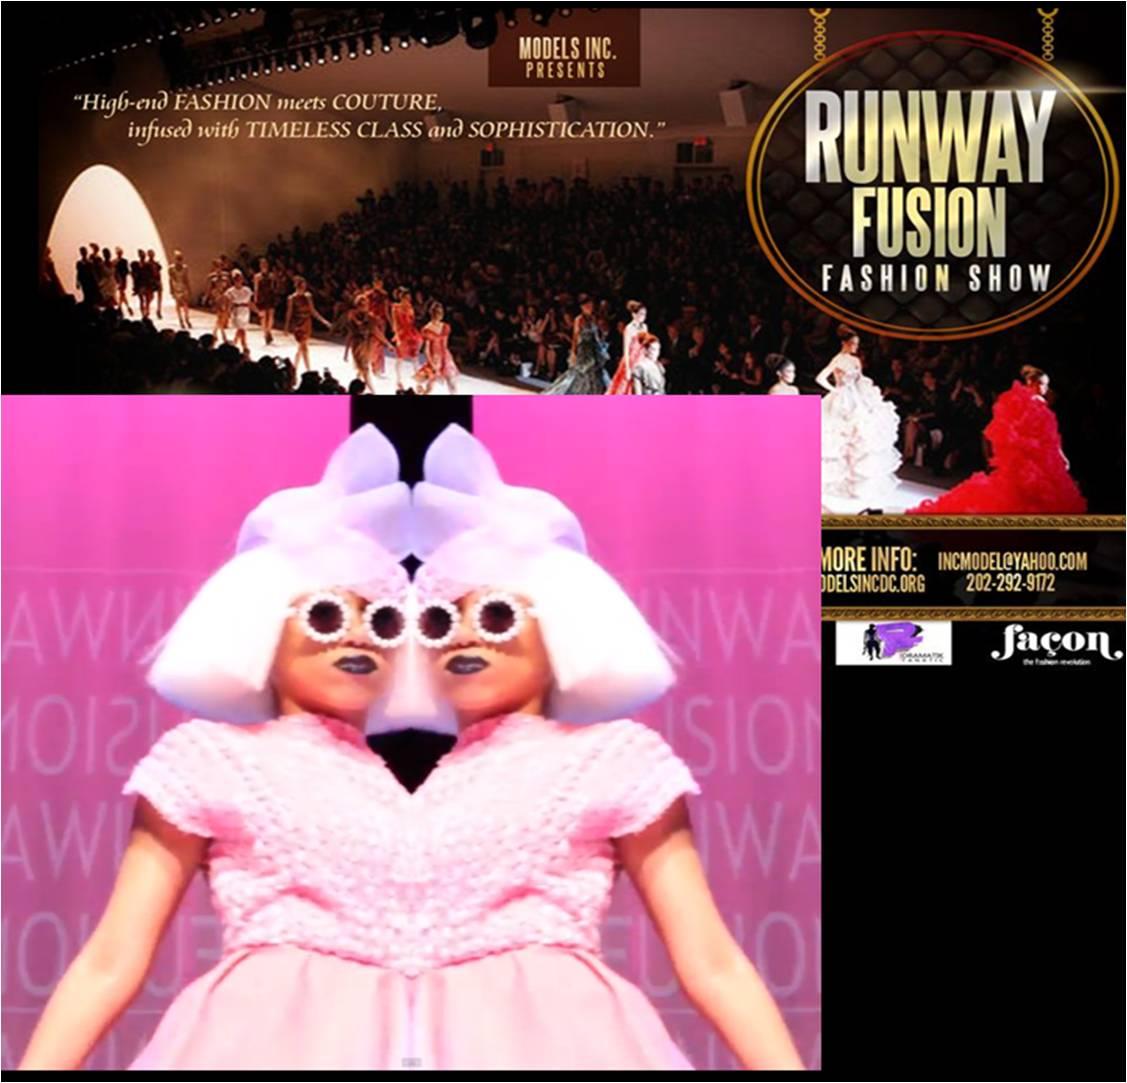 Runway Fusion show 2013